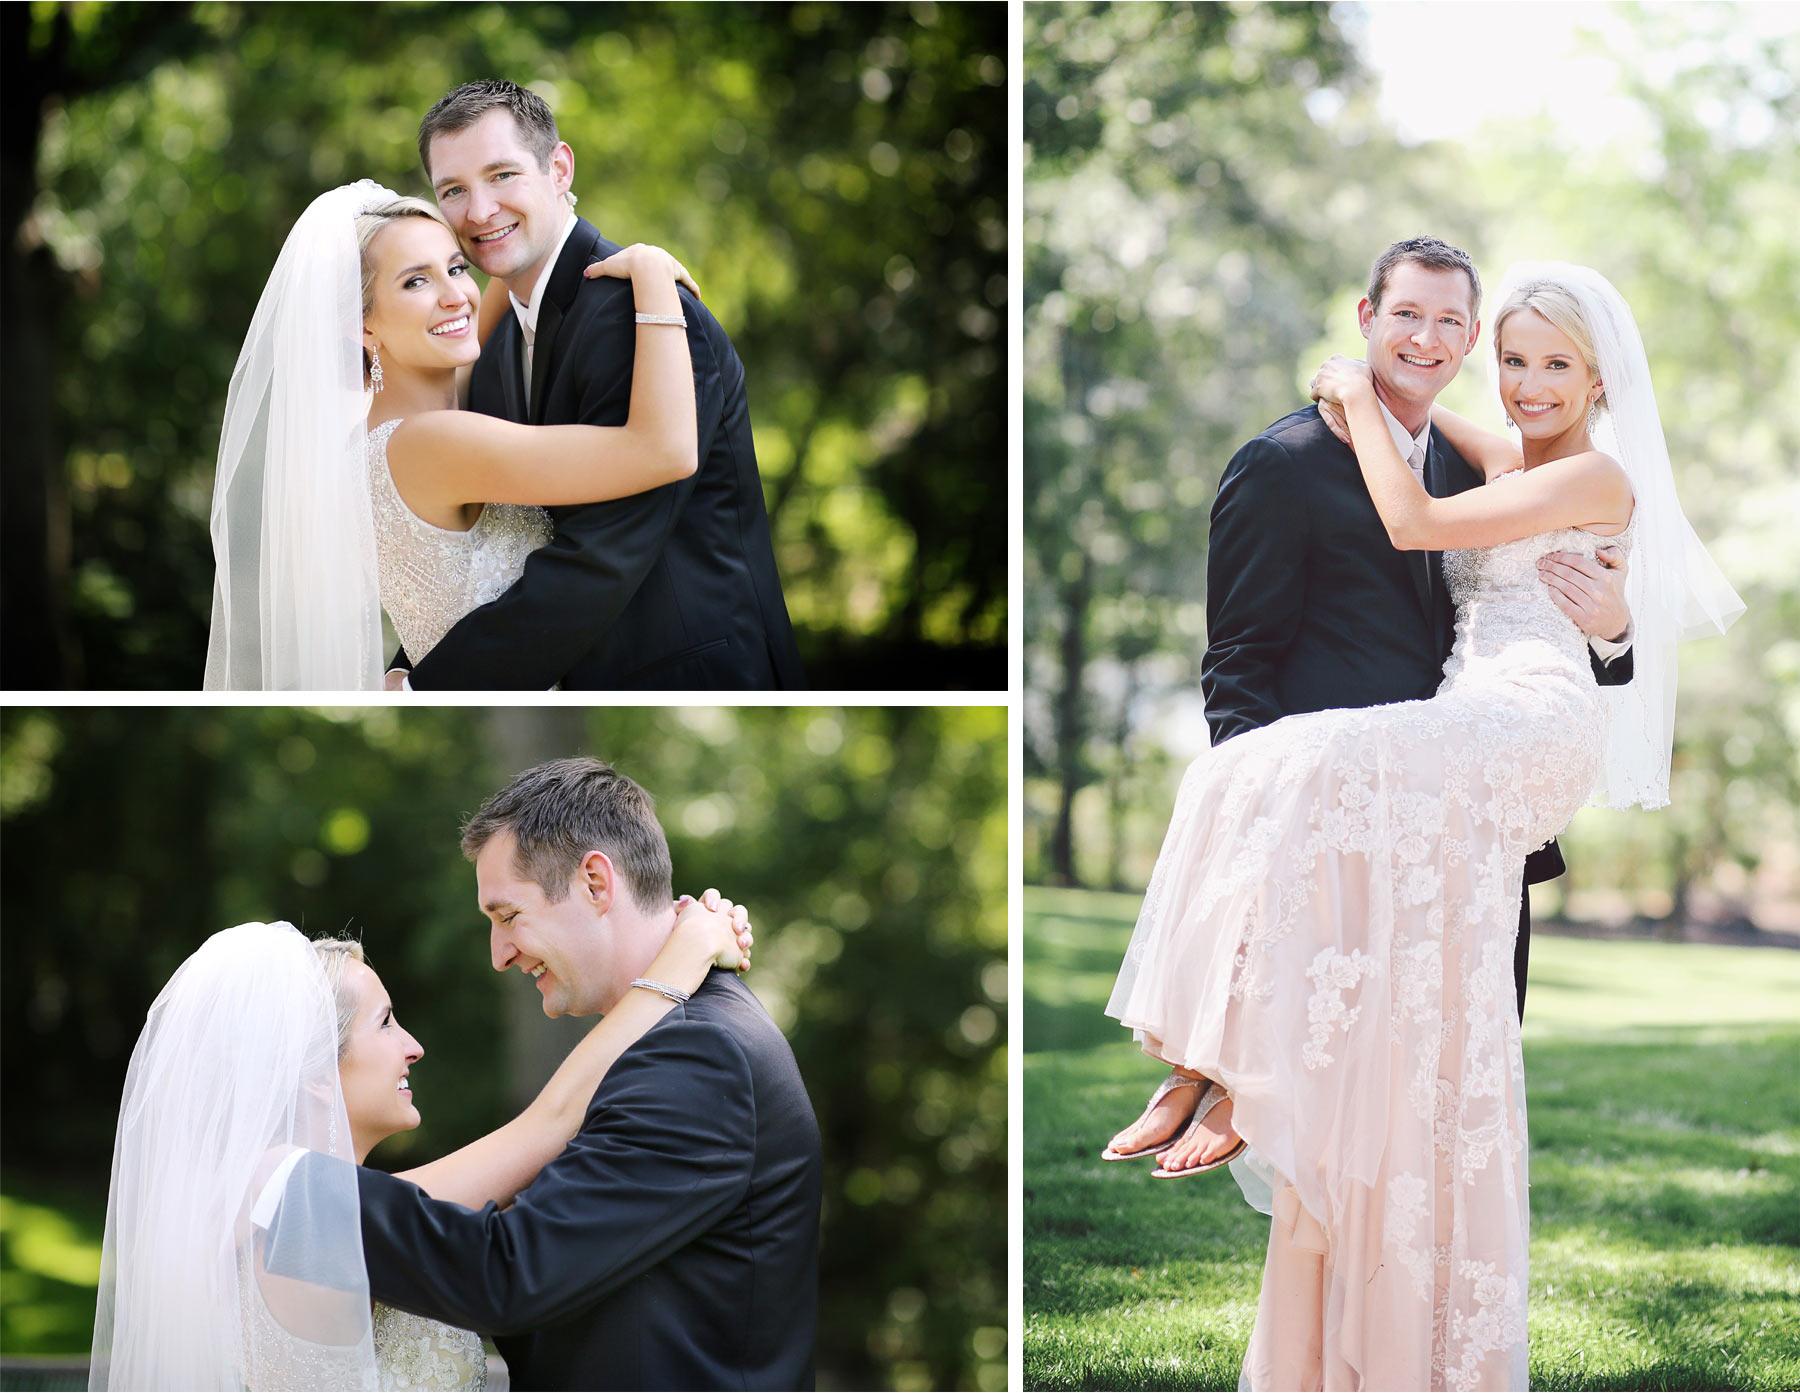 05-Minneapolis-Minnesota-Wedding-Photography-by-Vick-Photography-First-Look-Jenna-and-Josh.jpg